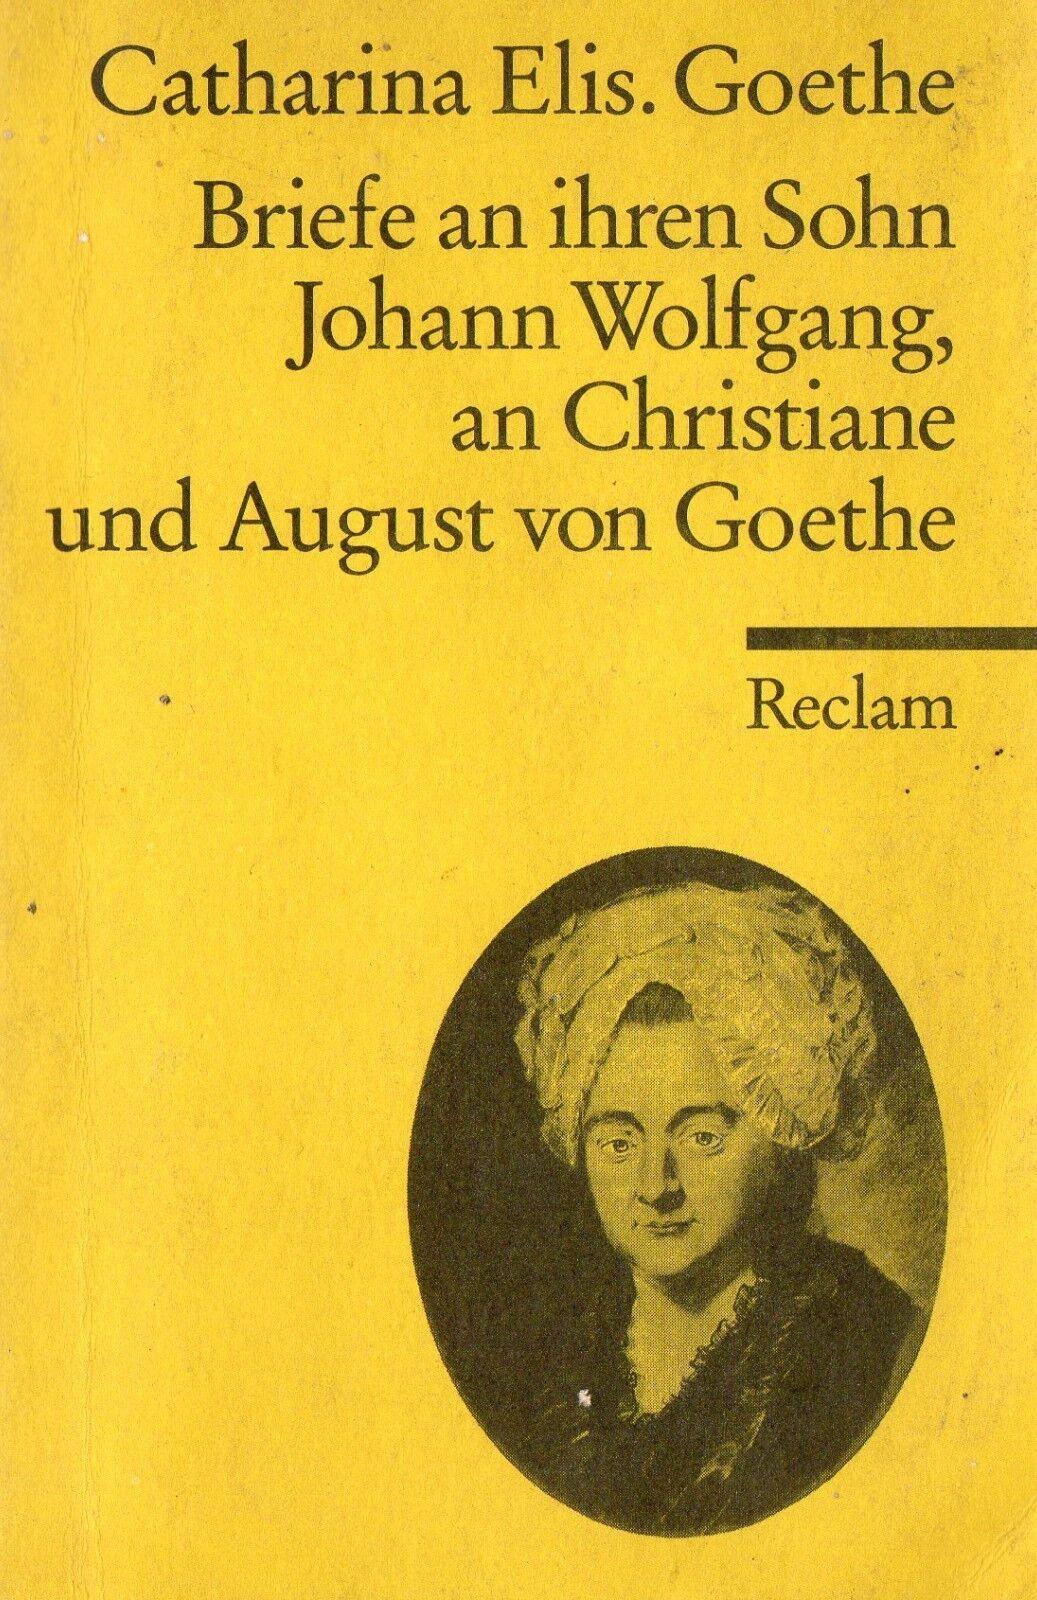 Reclam- 02786 C.E. GOETHE : BRIEFE AN JOHANN WOLFGANG, CHRISTIANE UND AUGUST